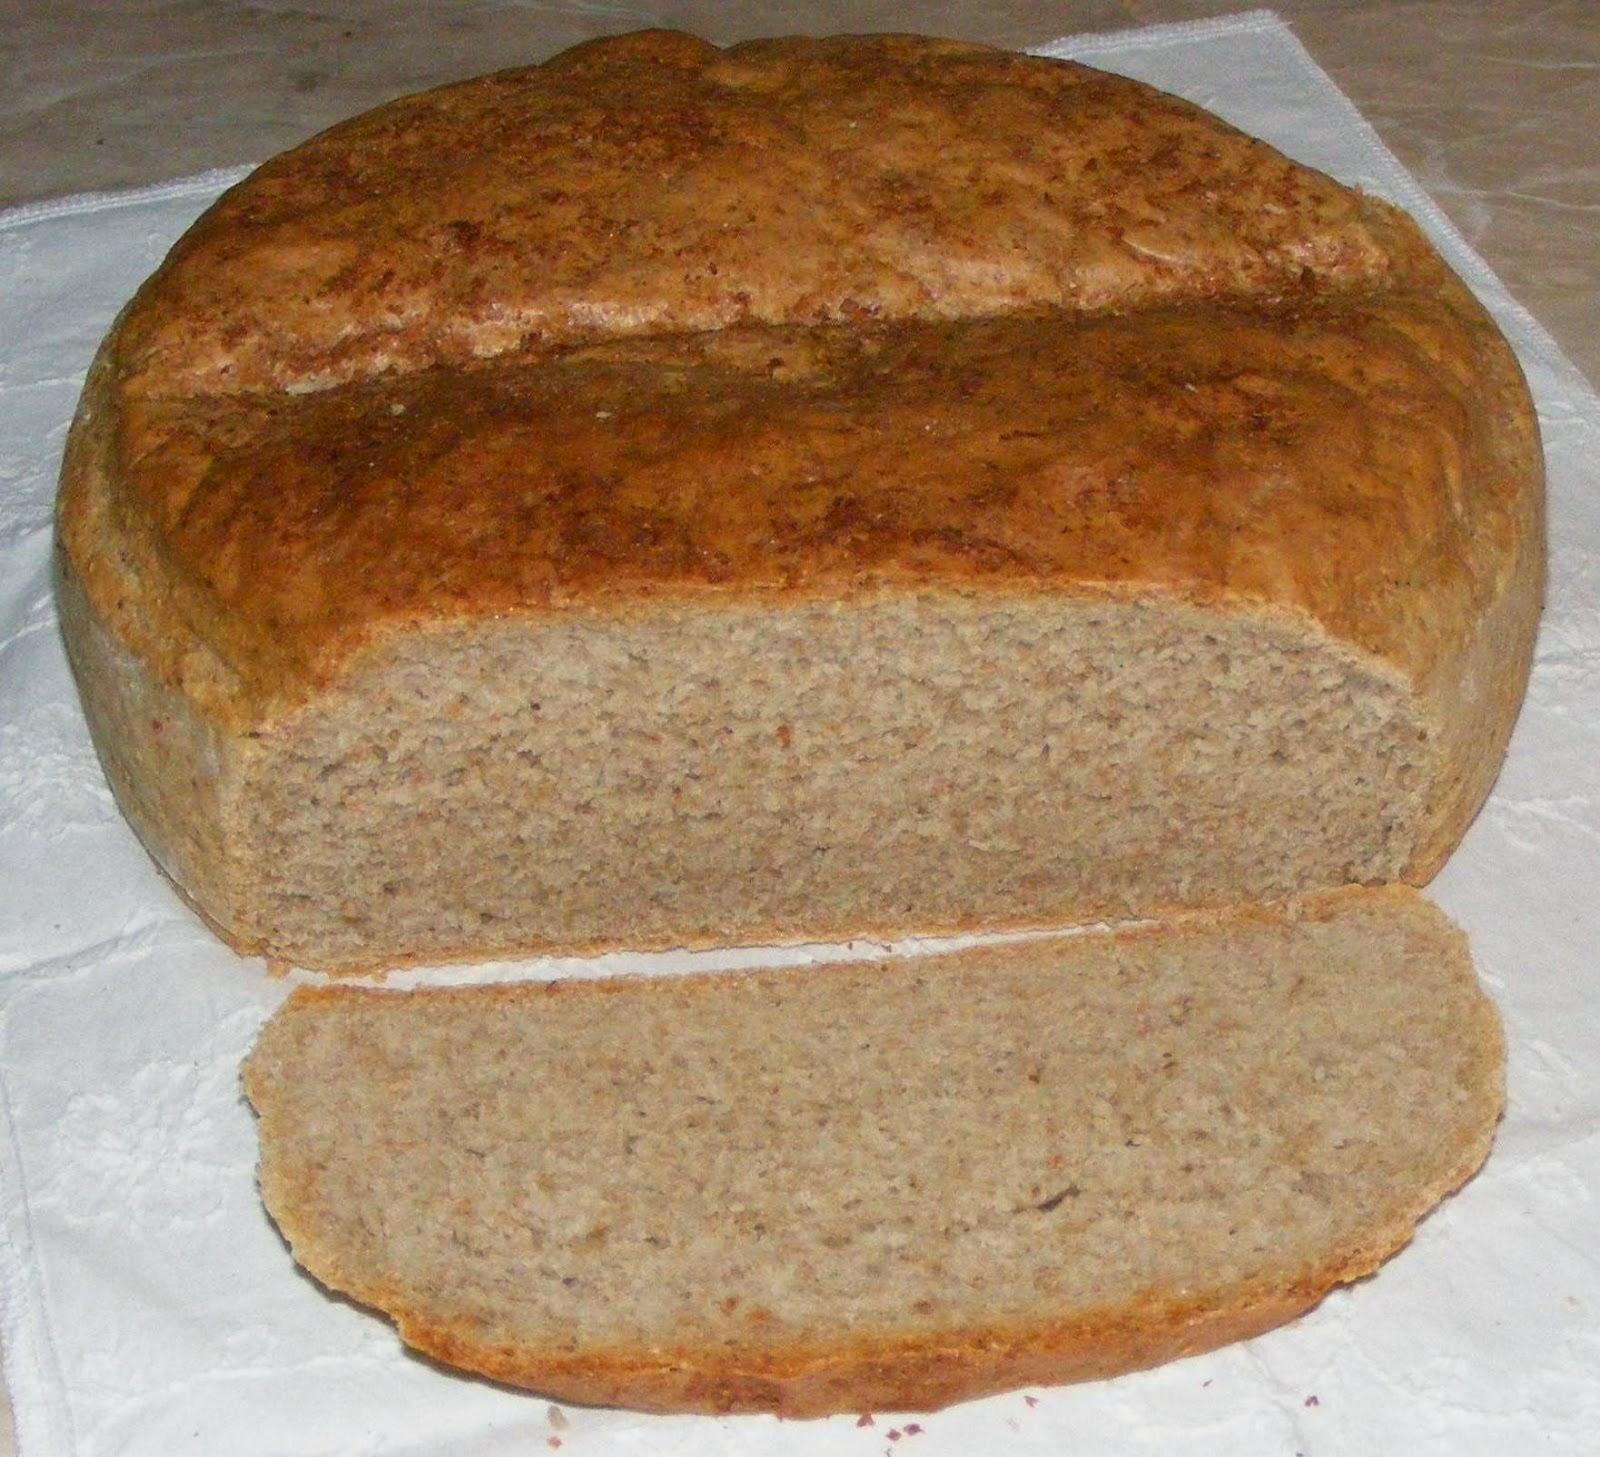 paine, retete paine, reteta paine, paine de casa, paine cu tarate, paine cu tarate de grau, retete culinare, preparate culinare, diete, cura de slabire, diete de slabit, retete de mancare, mancare, paine pufoasa, paine cu seminte, paine integrala,